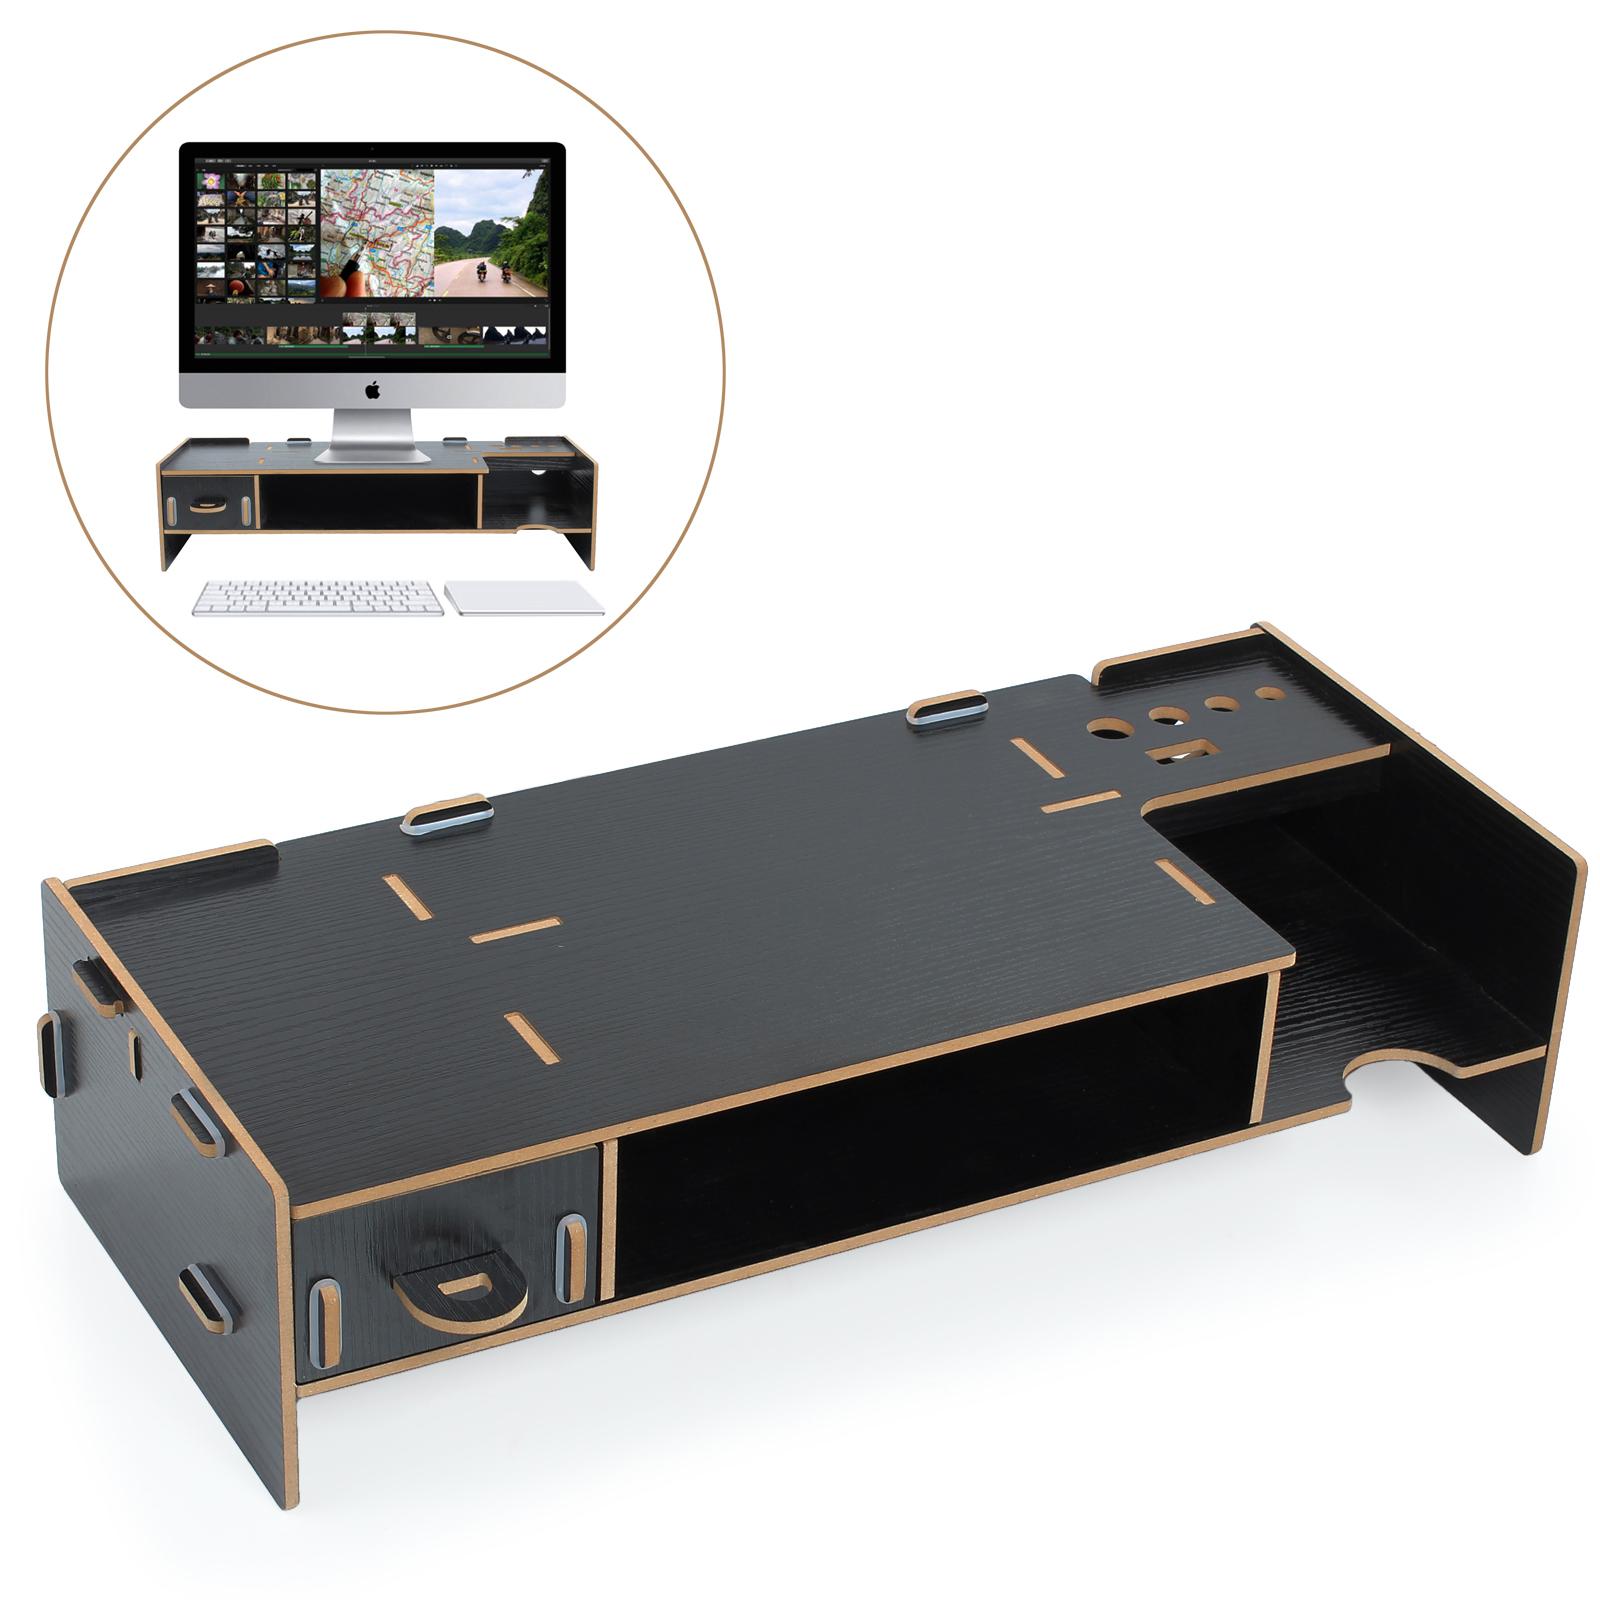 Black Wooden Desktop Monitor Stand Laptop Display Screen Riser Shelf